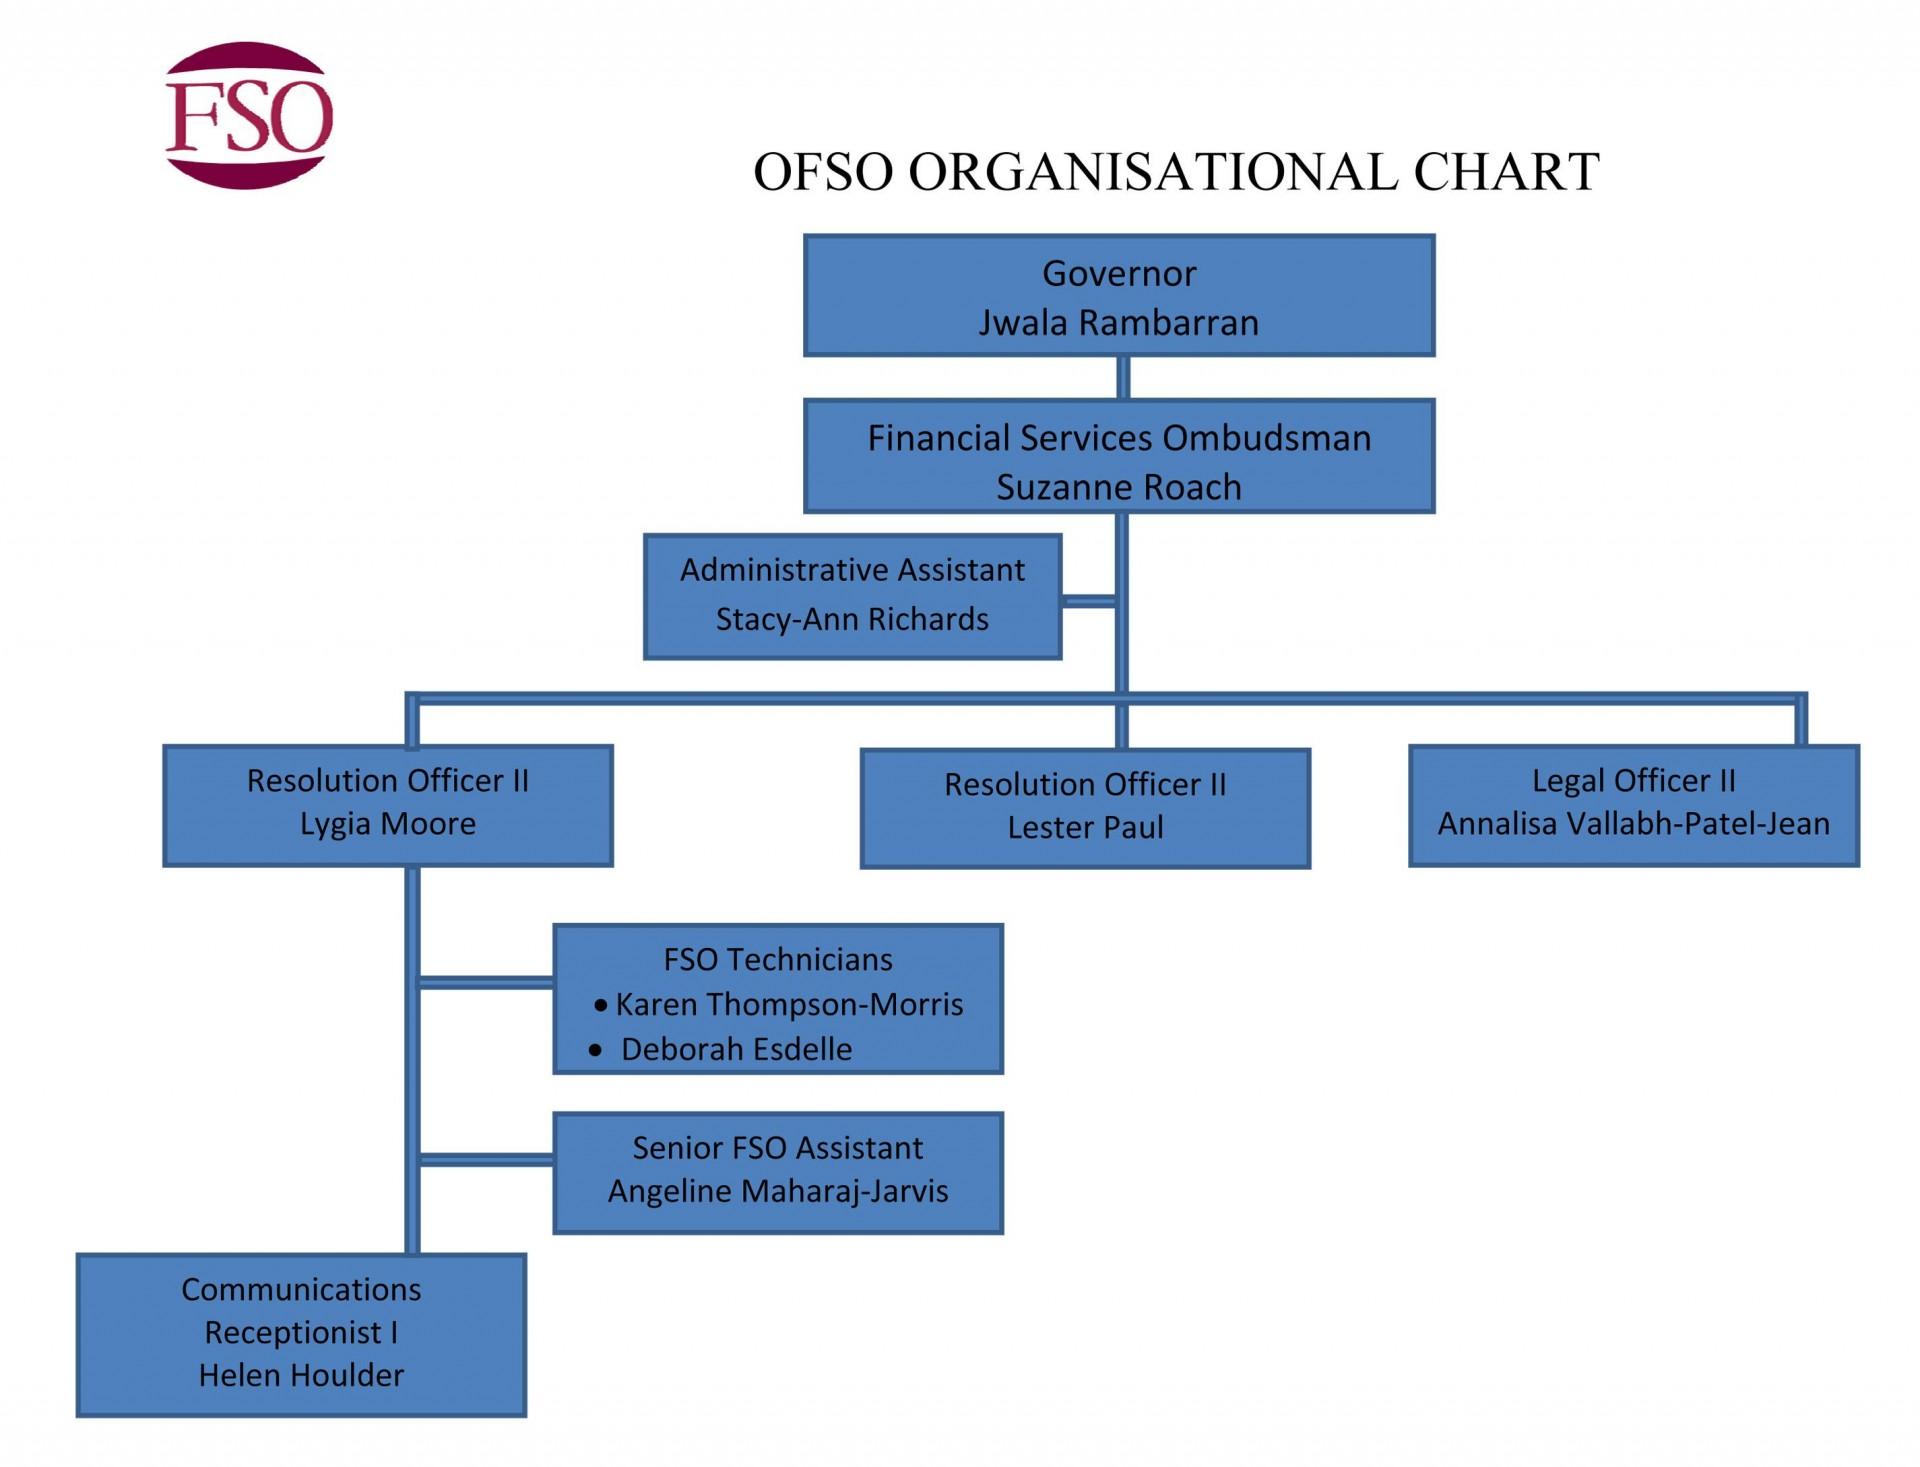 003 Unusual Organization Chart Template Word 2013 Idea  Organizational Free Microsoft1920